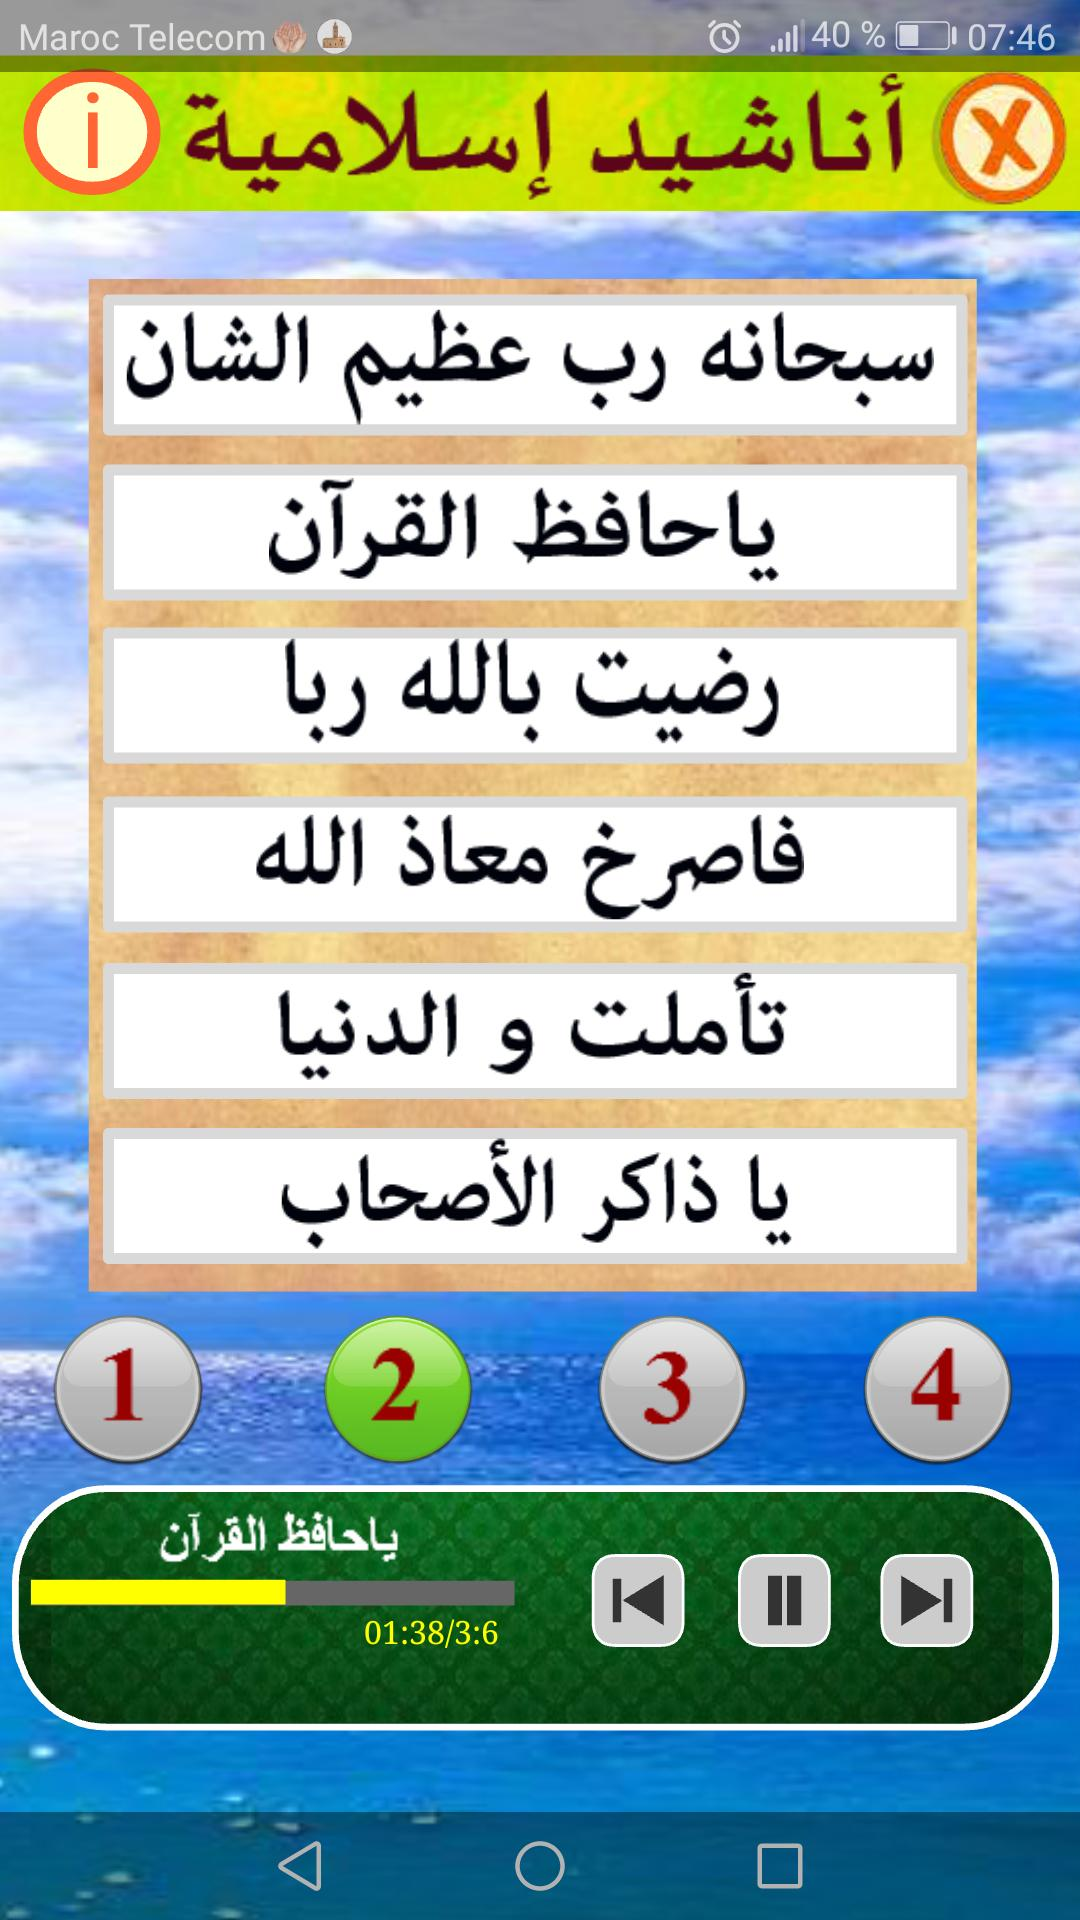 أناشيد إسلامية بدون نت for Android - APK Download